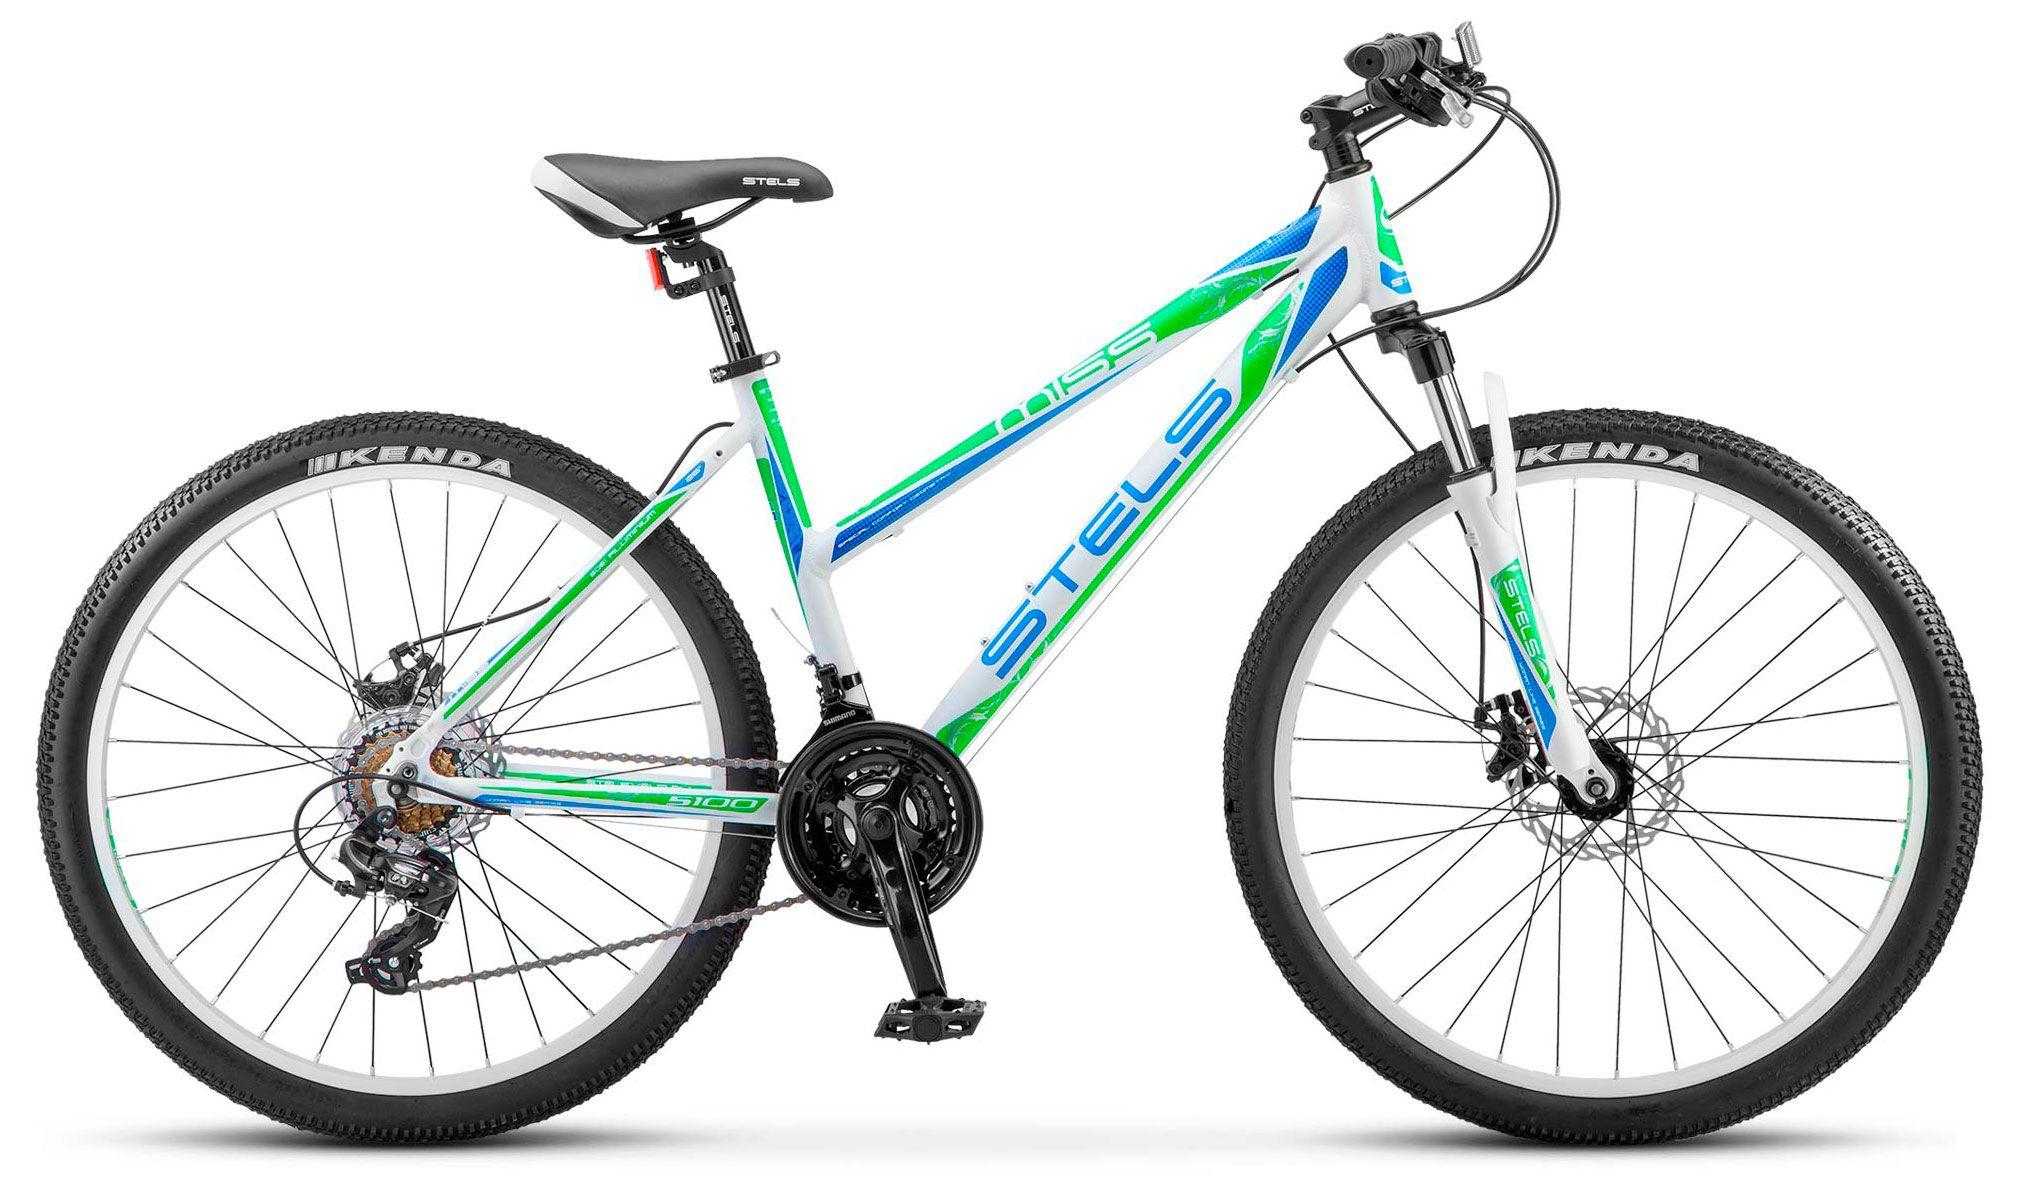 Велосипед Stels Miss 5100 MD 26 (V031) 2018 велосипед stels miss 6100 md 26 2017